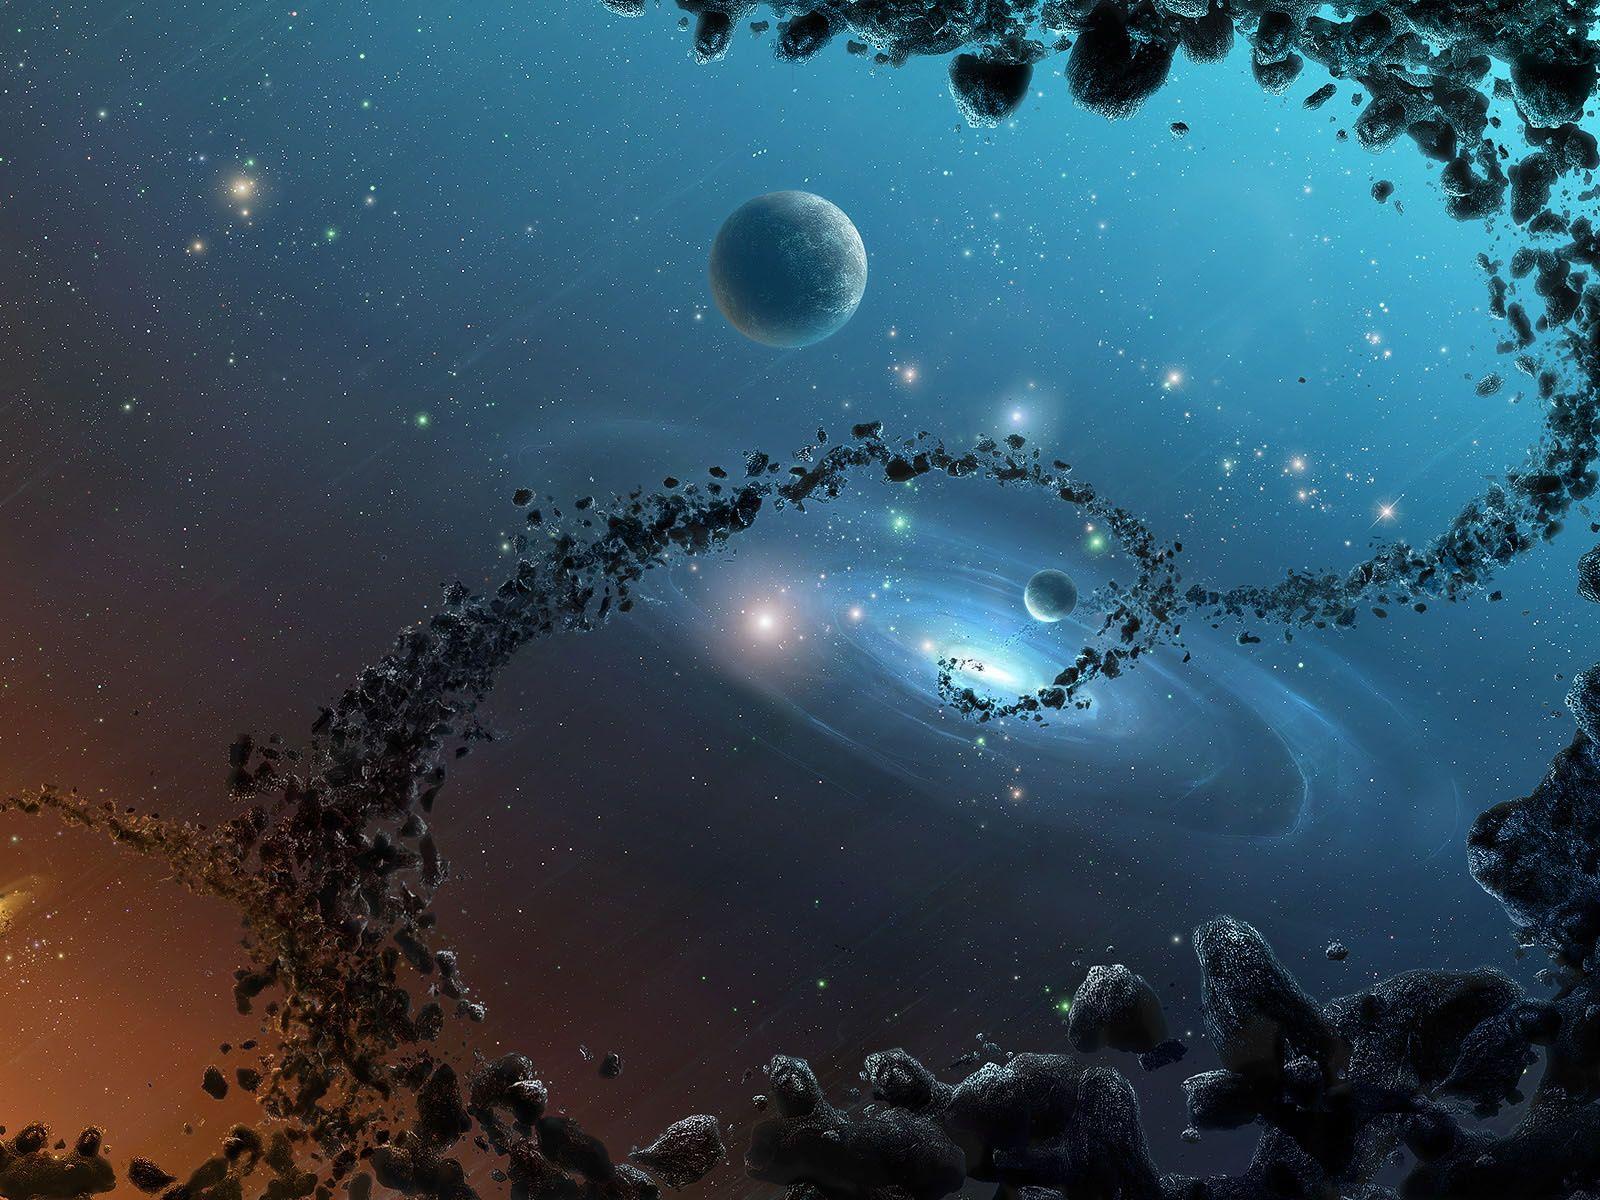 Wallpaper download free image - Galaxy